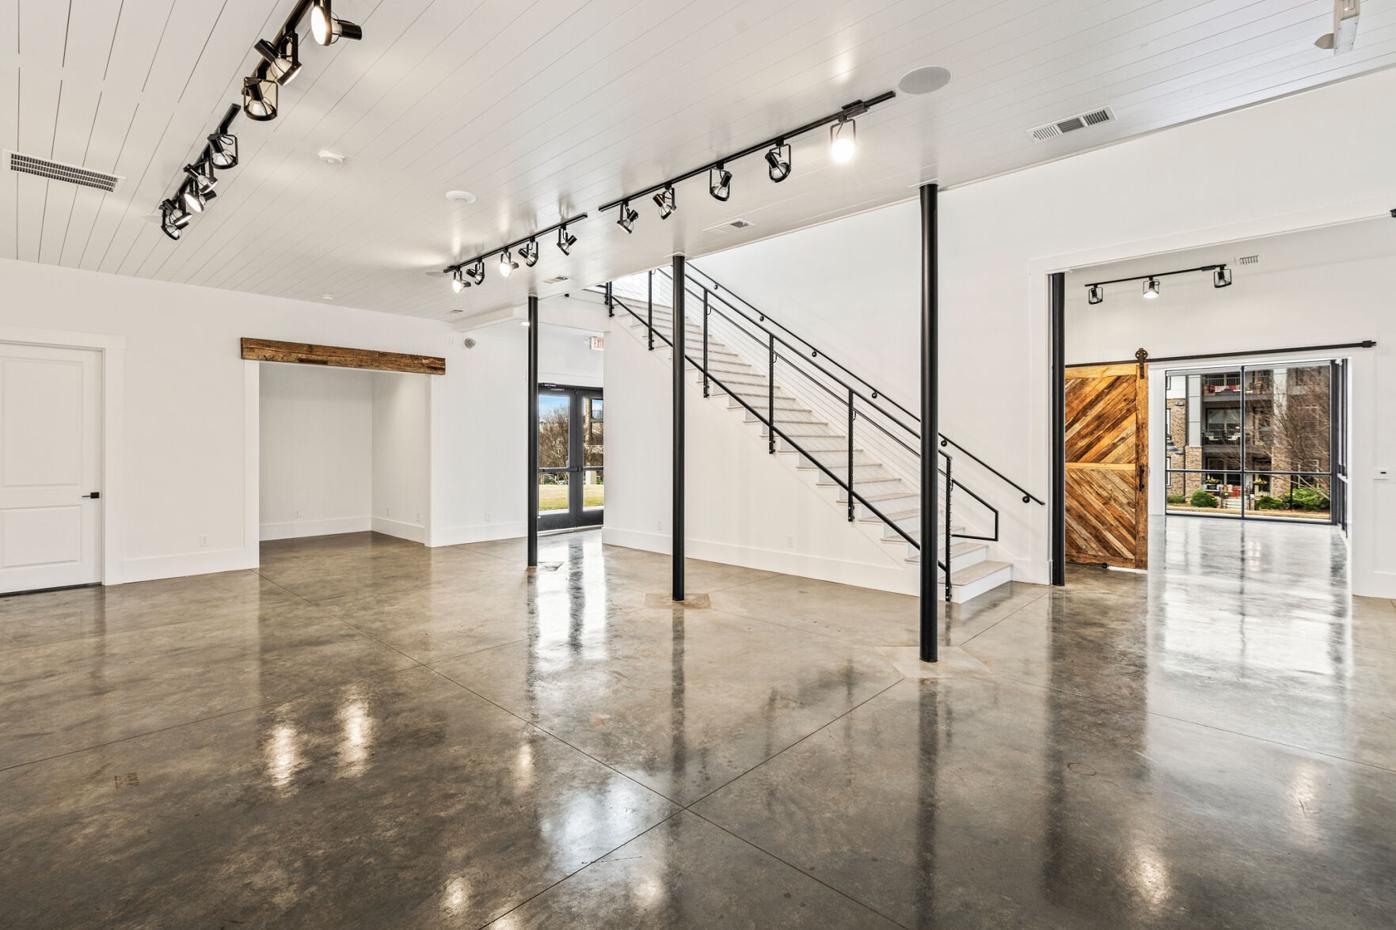 Reeves House Gallery